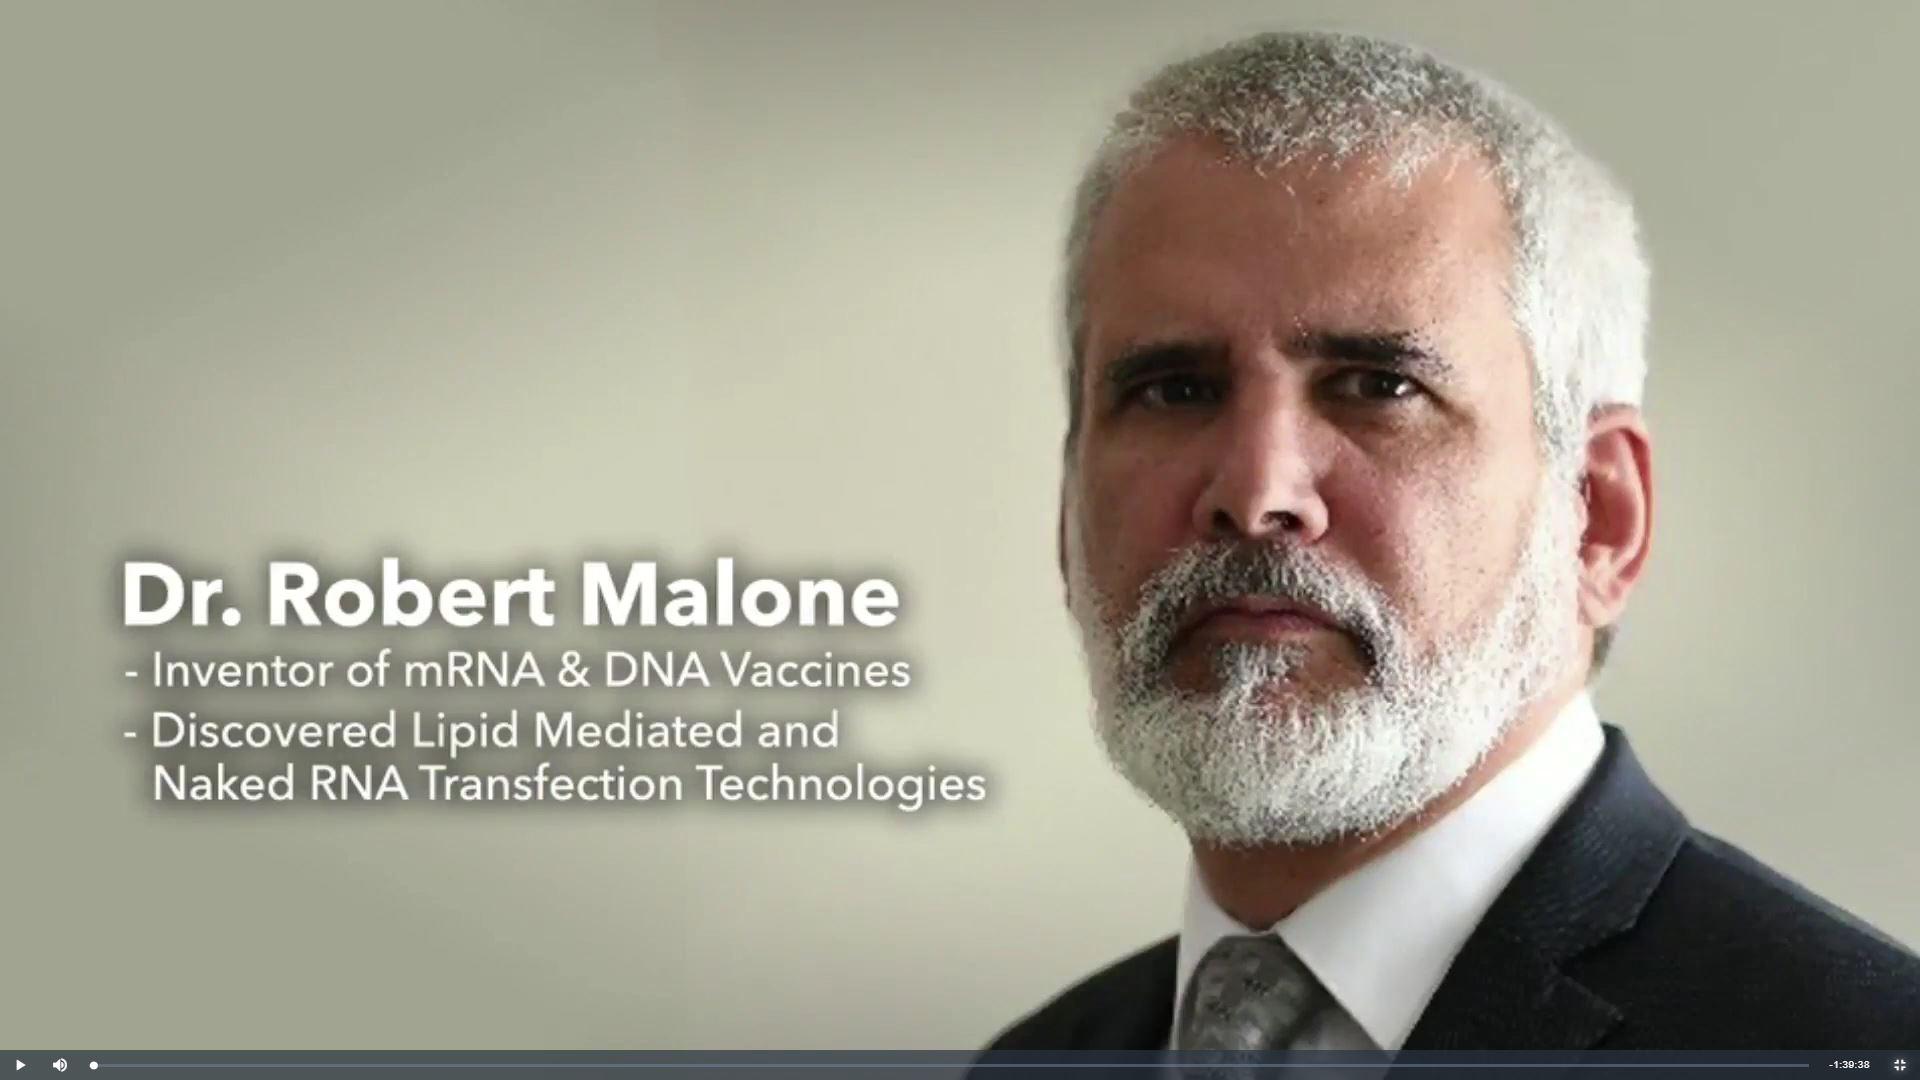 Dr Robert Malone